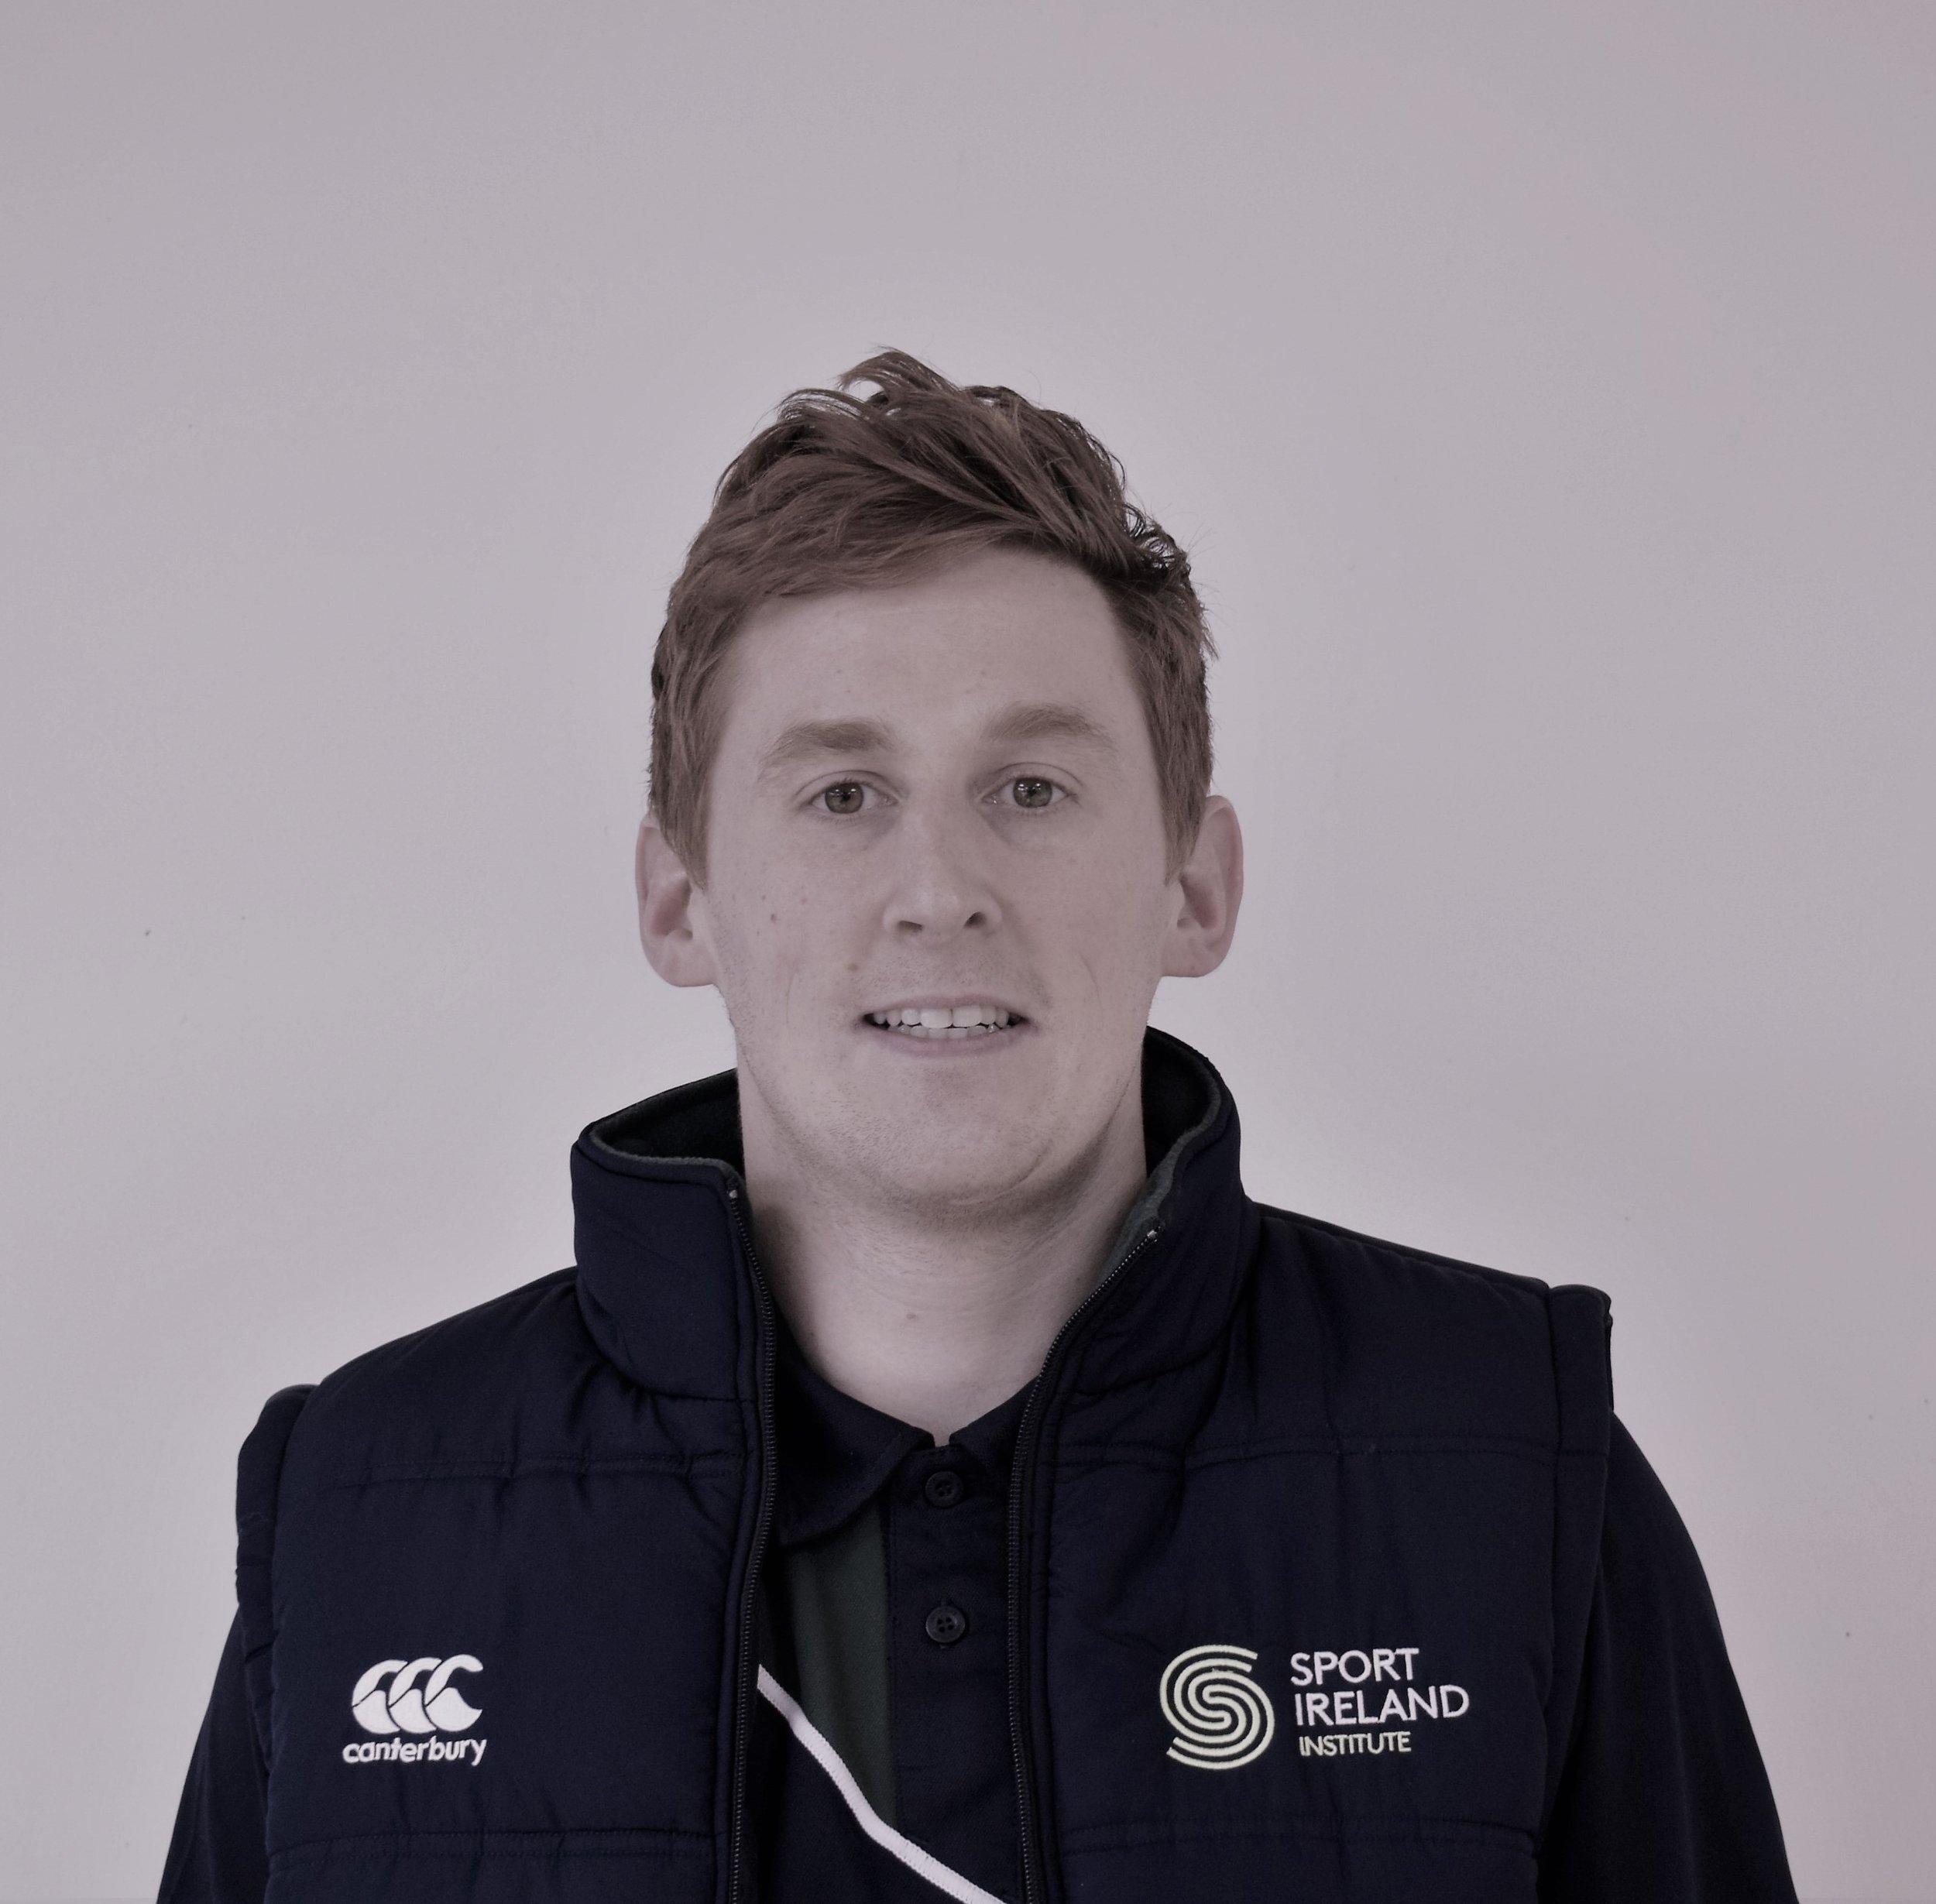 Niall O'Donoghue, Performance Life-Skills